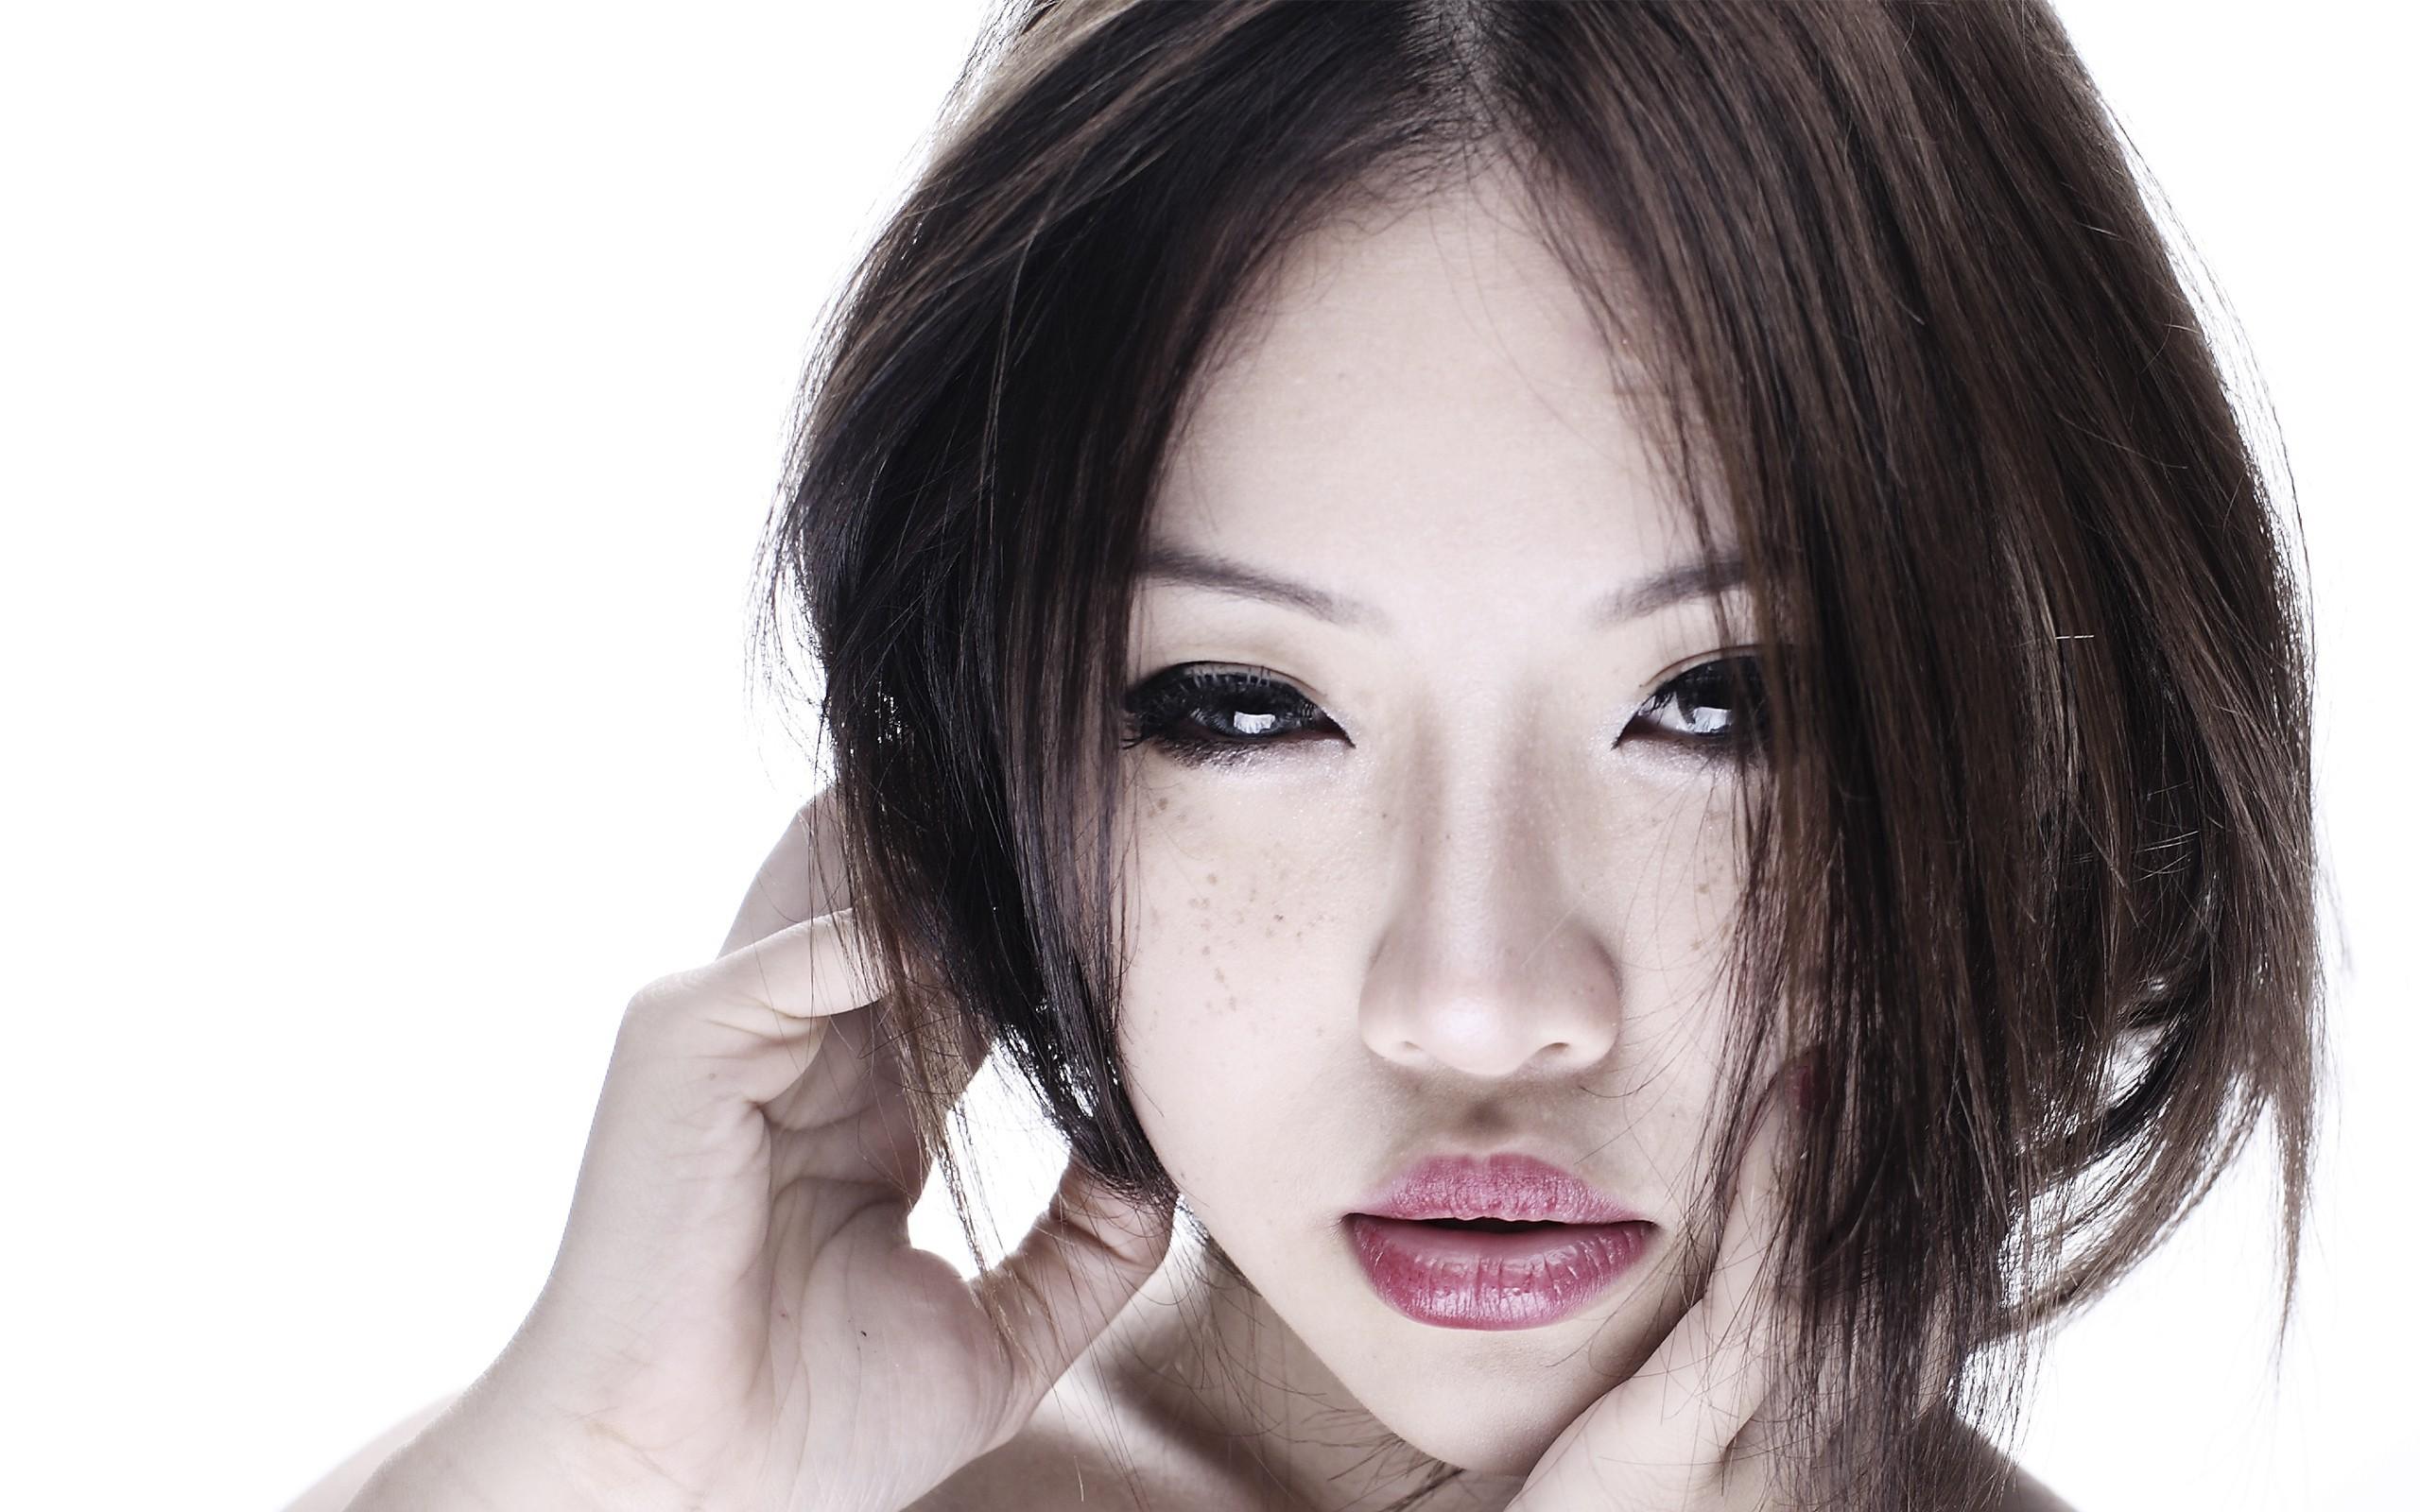 Asian women with full lips